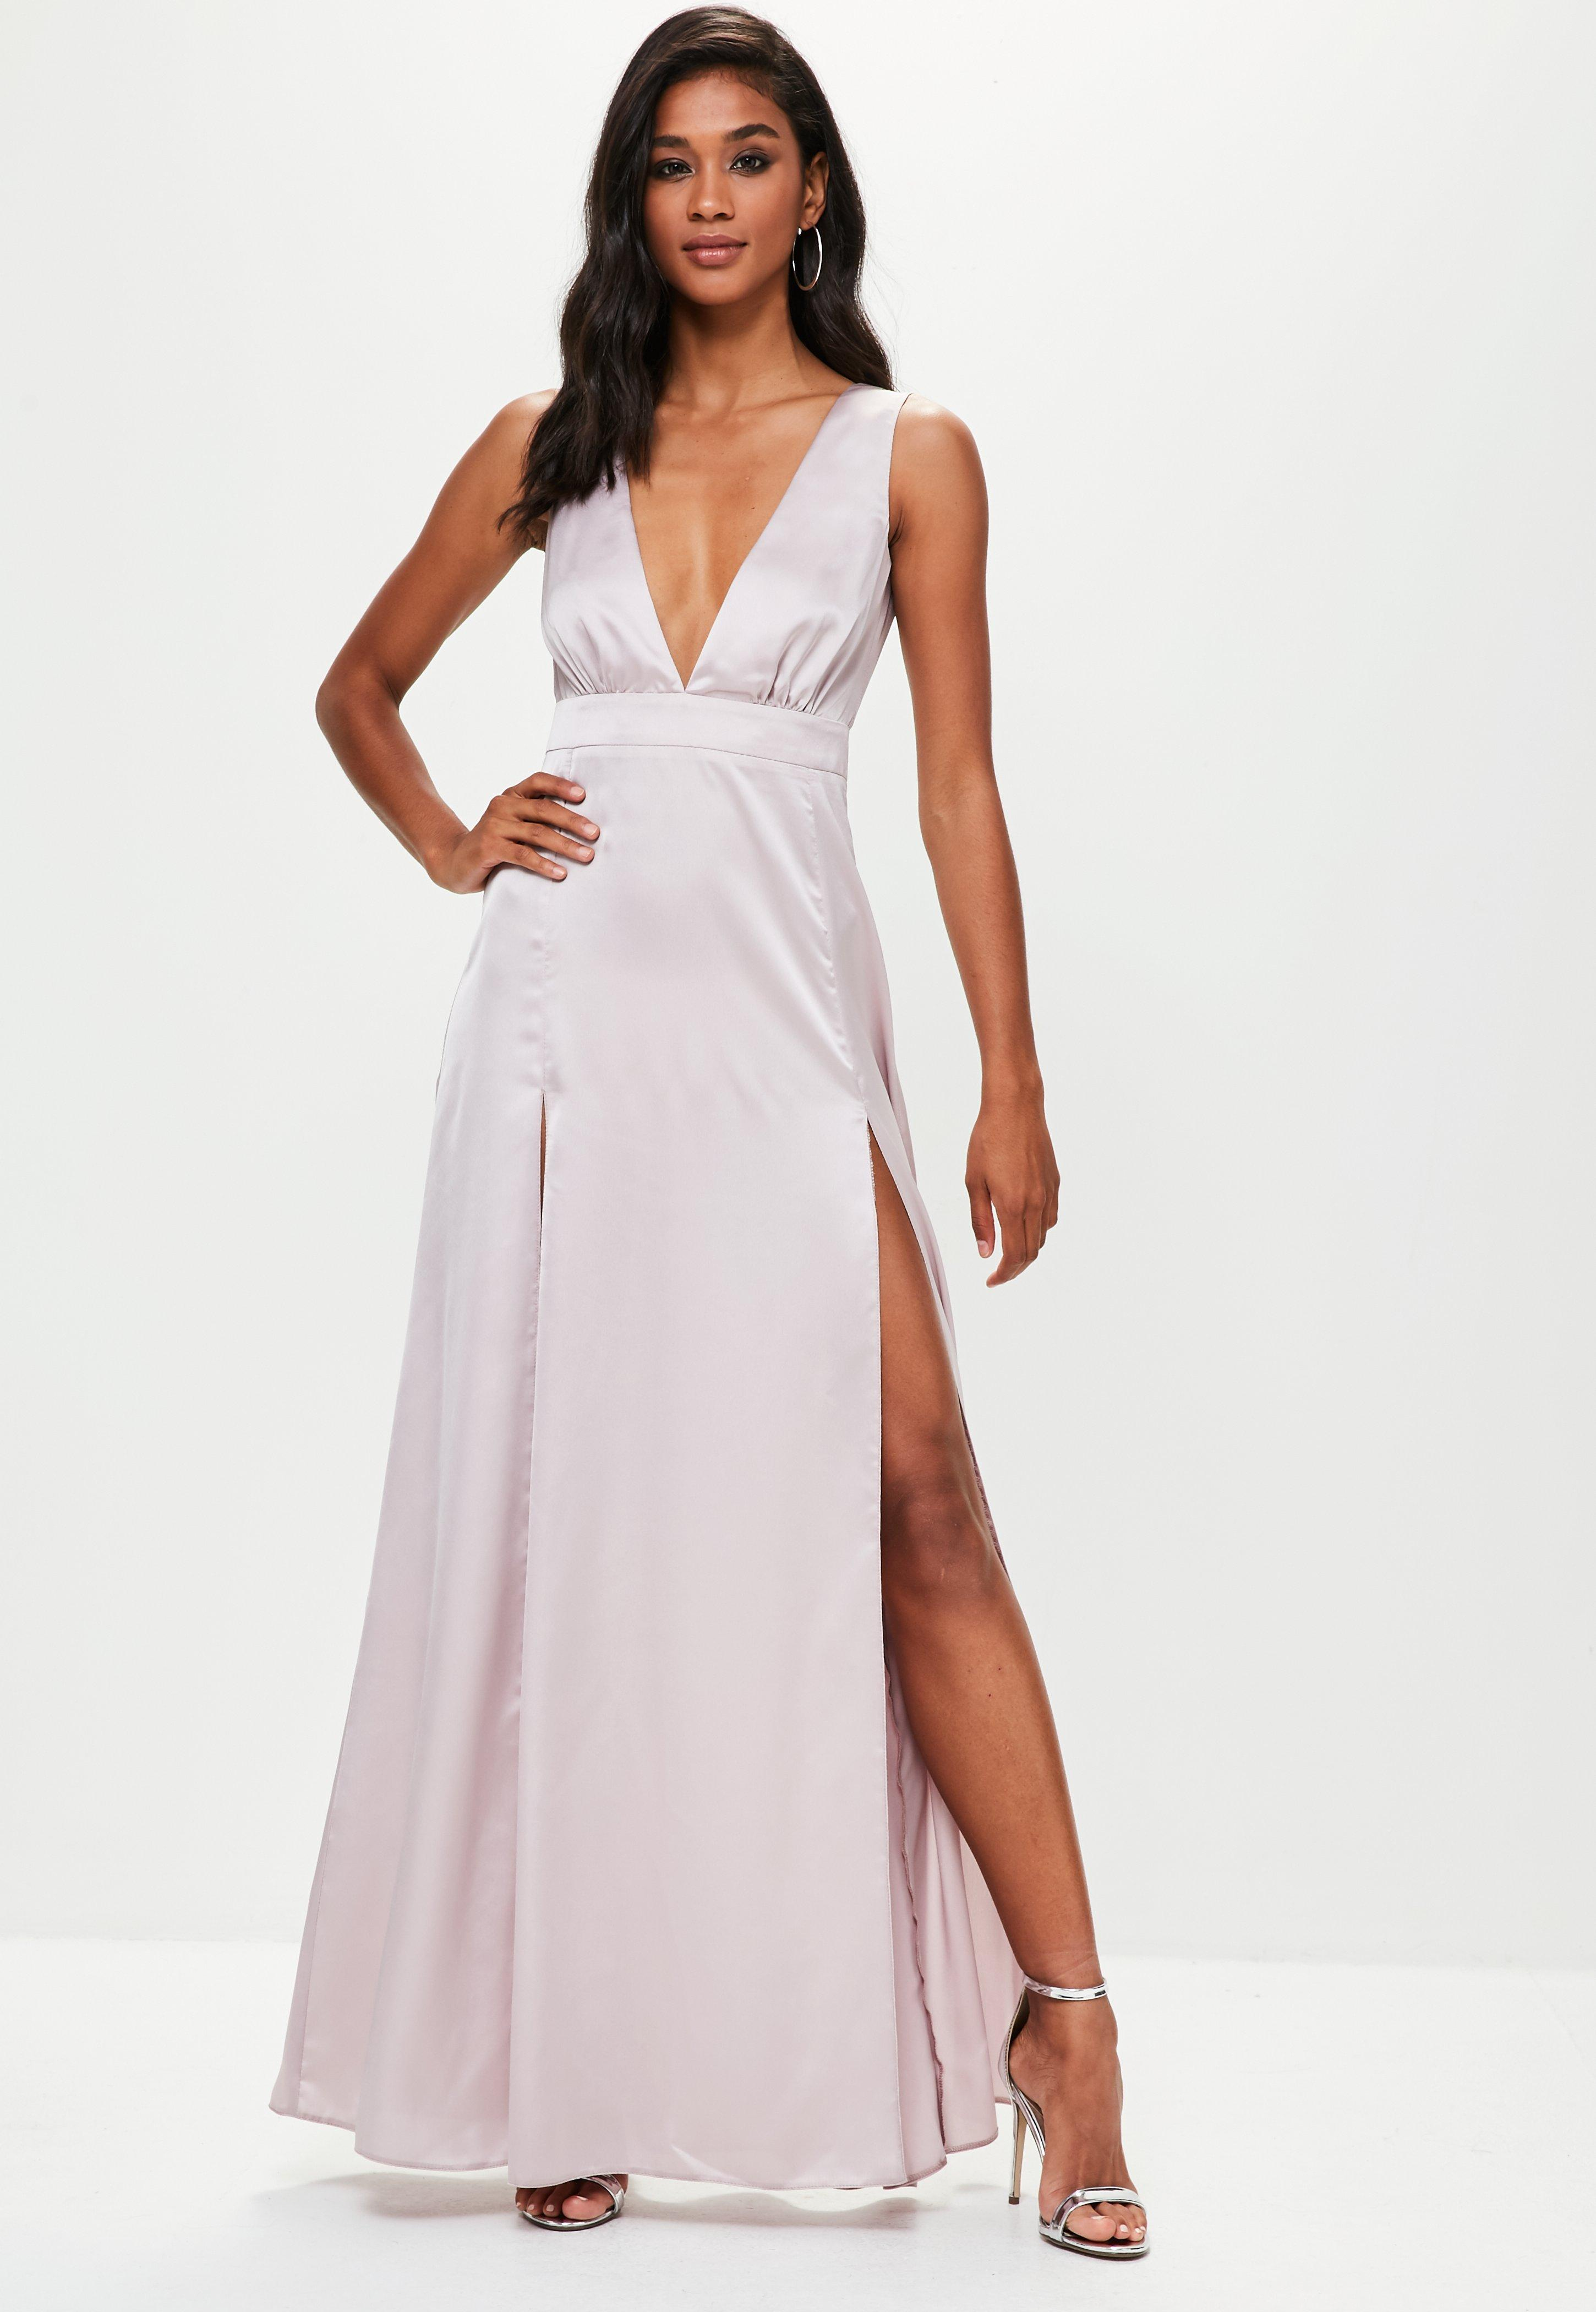 Satinkleider   Seidige Kleider online shoppen - Missguided DE